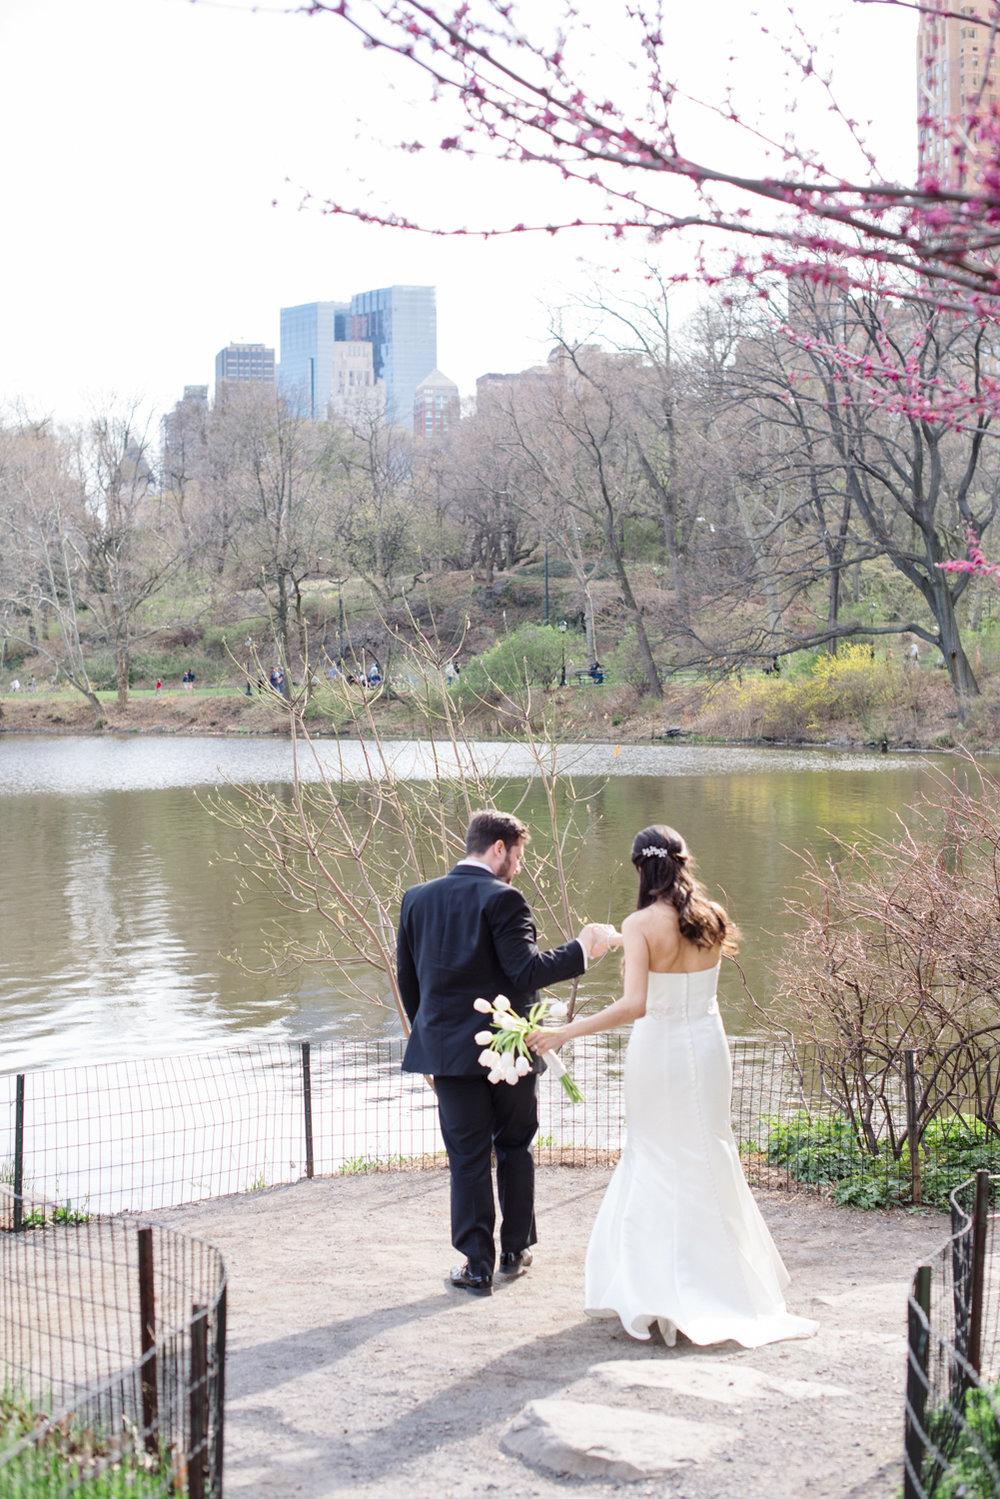 Anahi+David- Central Park Elopement- New York City- Olivia Christina Photo (223).JPG